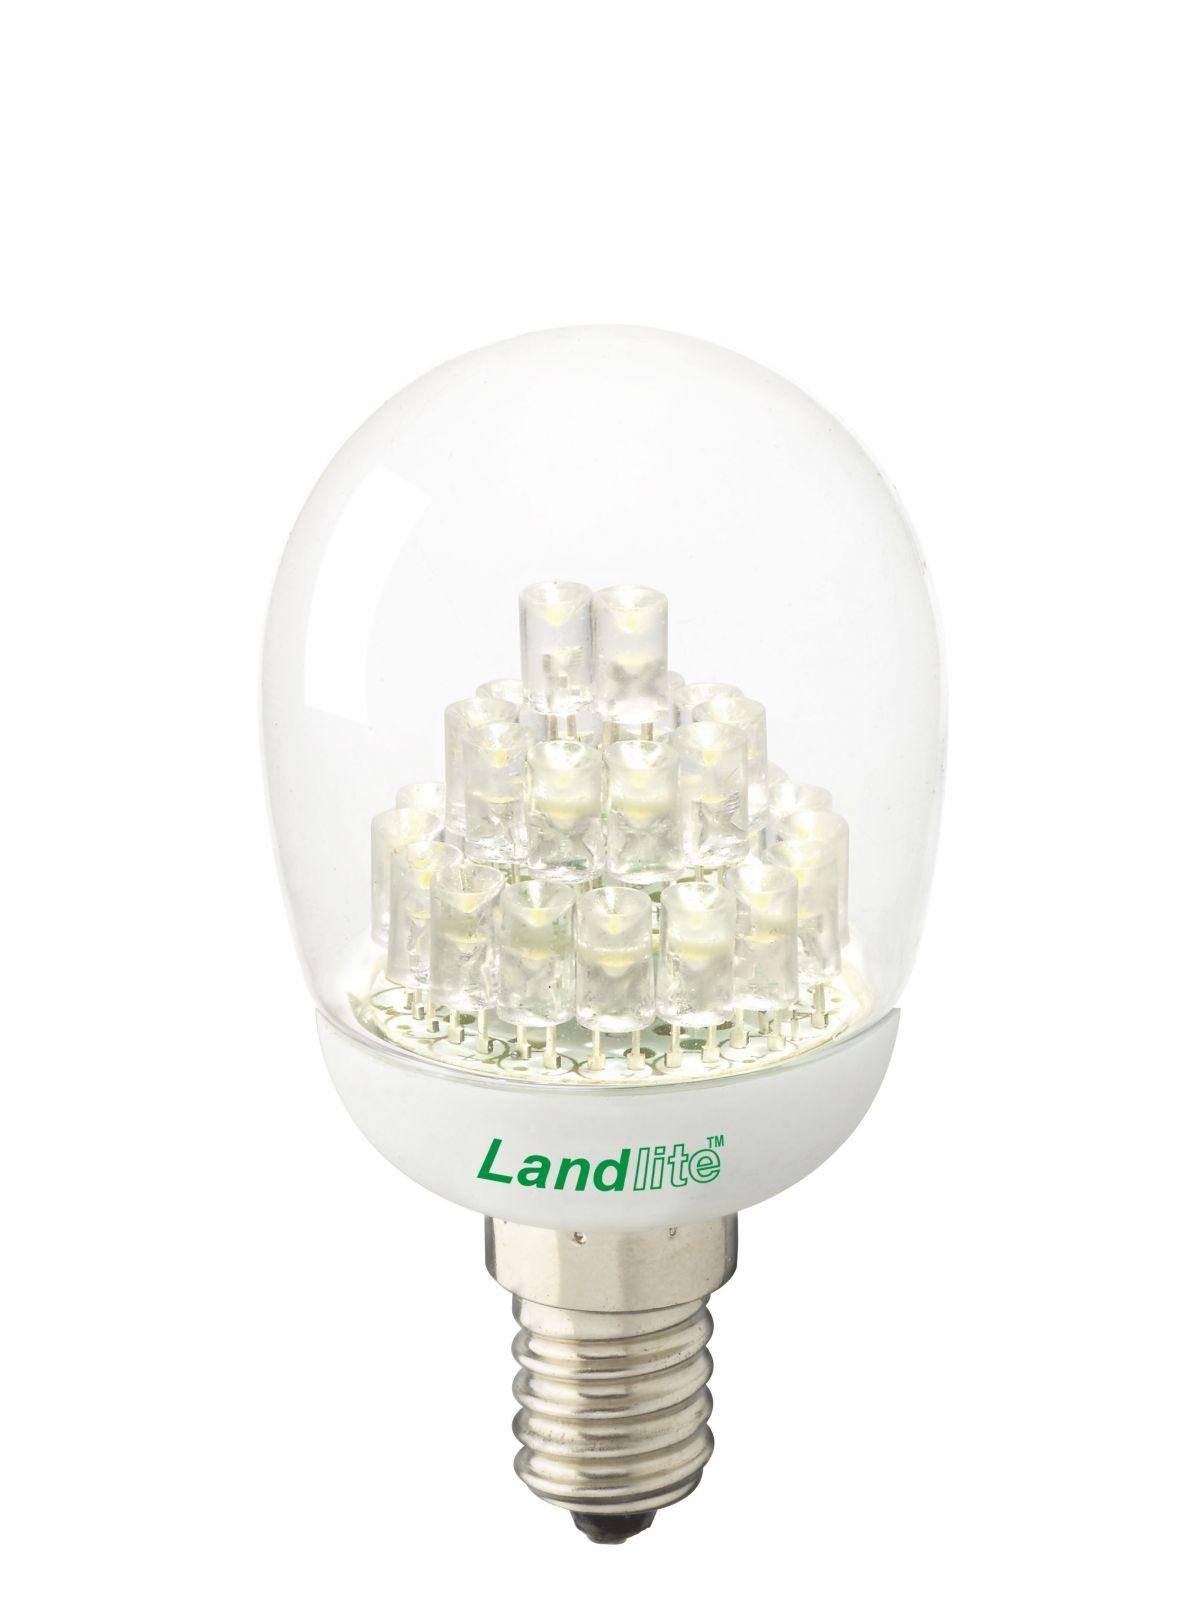 01CEL007 Wunderbar Led Lampen E14 Dekorationen